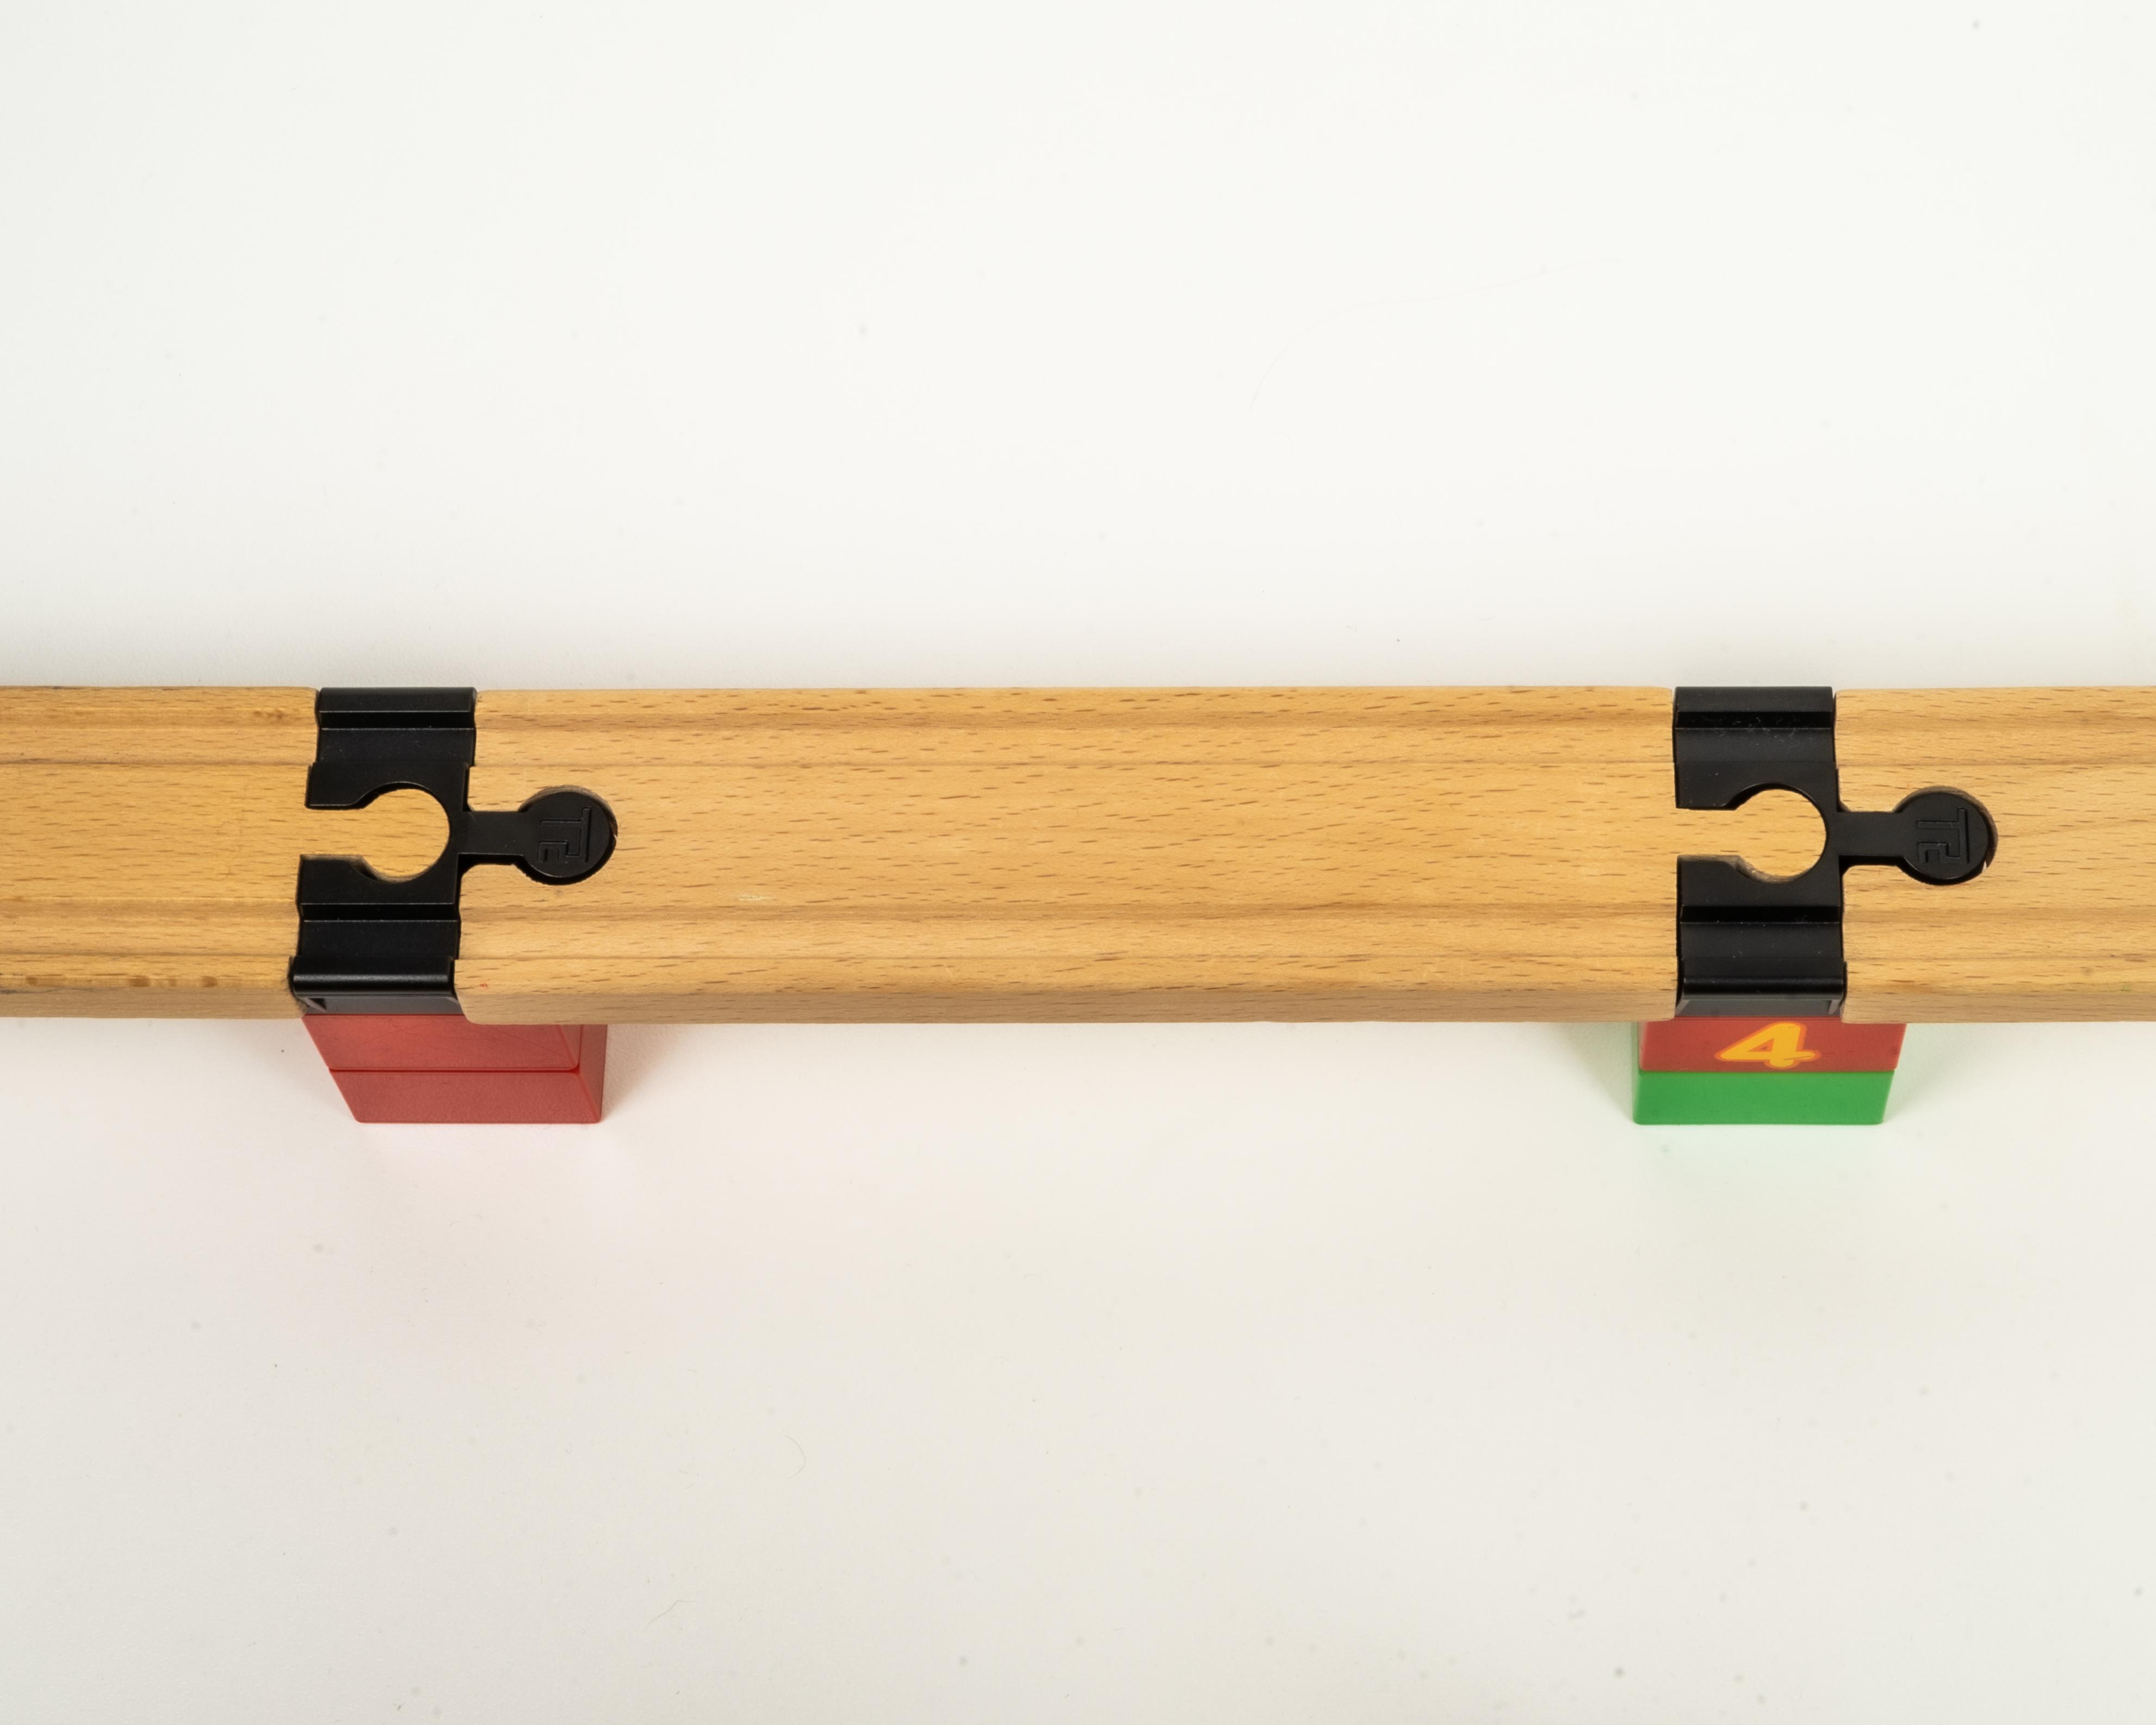 TOY2 Toy2 - Tågebanedelar - Startpaket - Litet